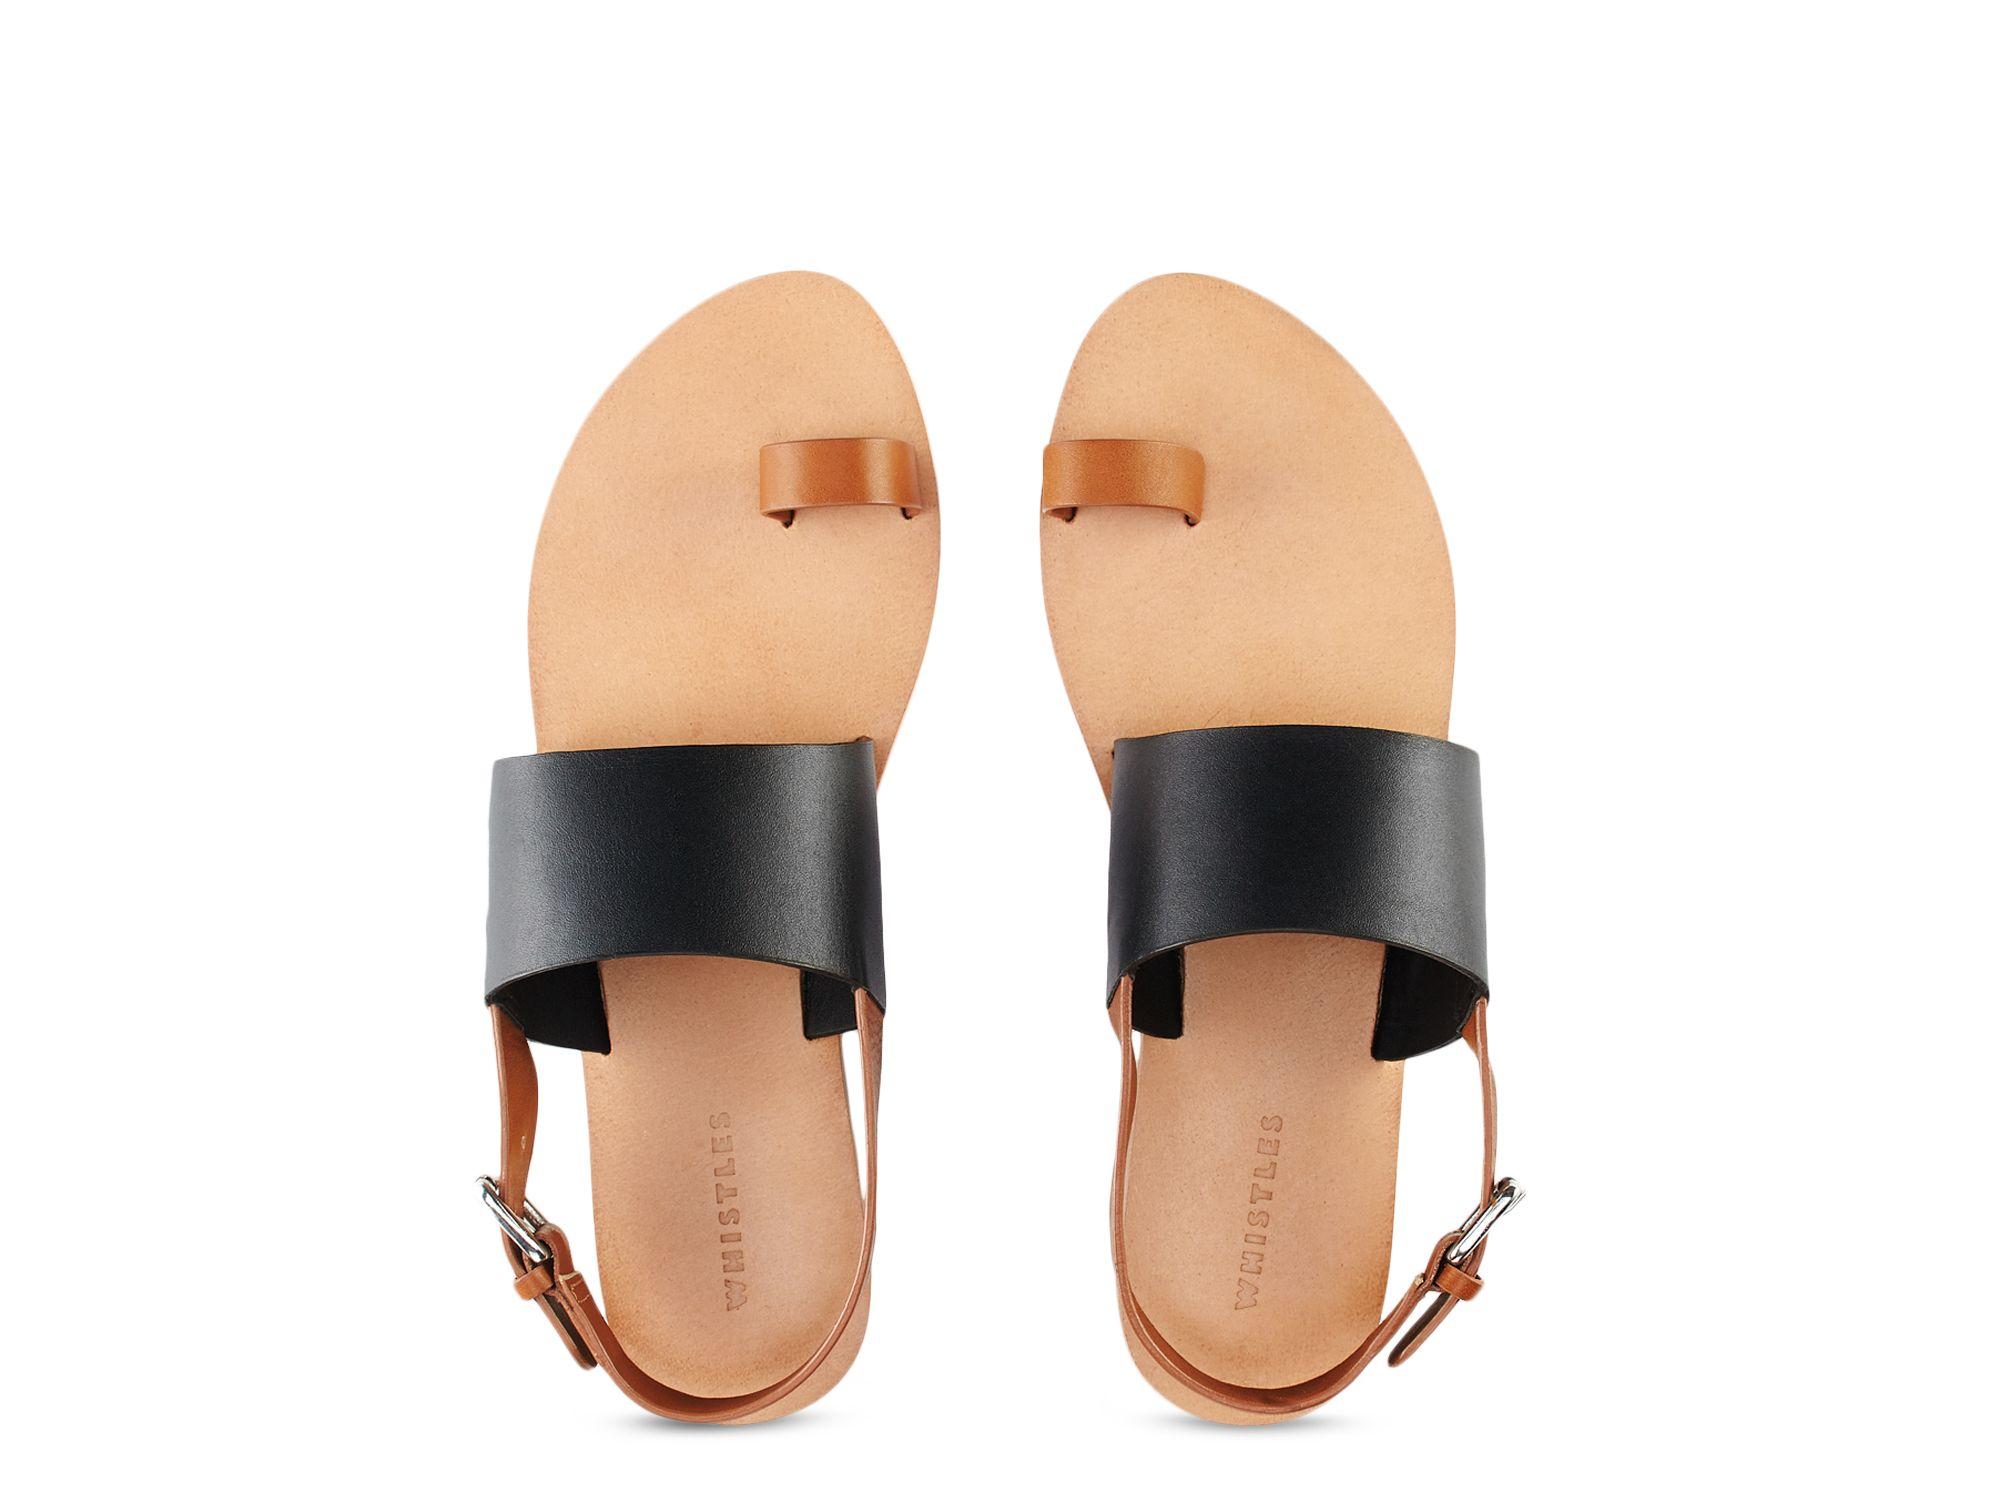 Whistles Flat Sandals Aralia Toe Ring Slingback In Brown